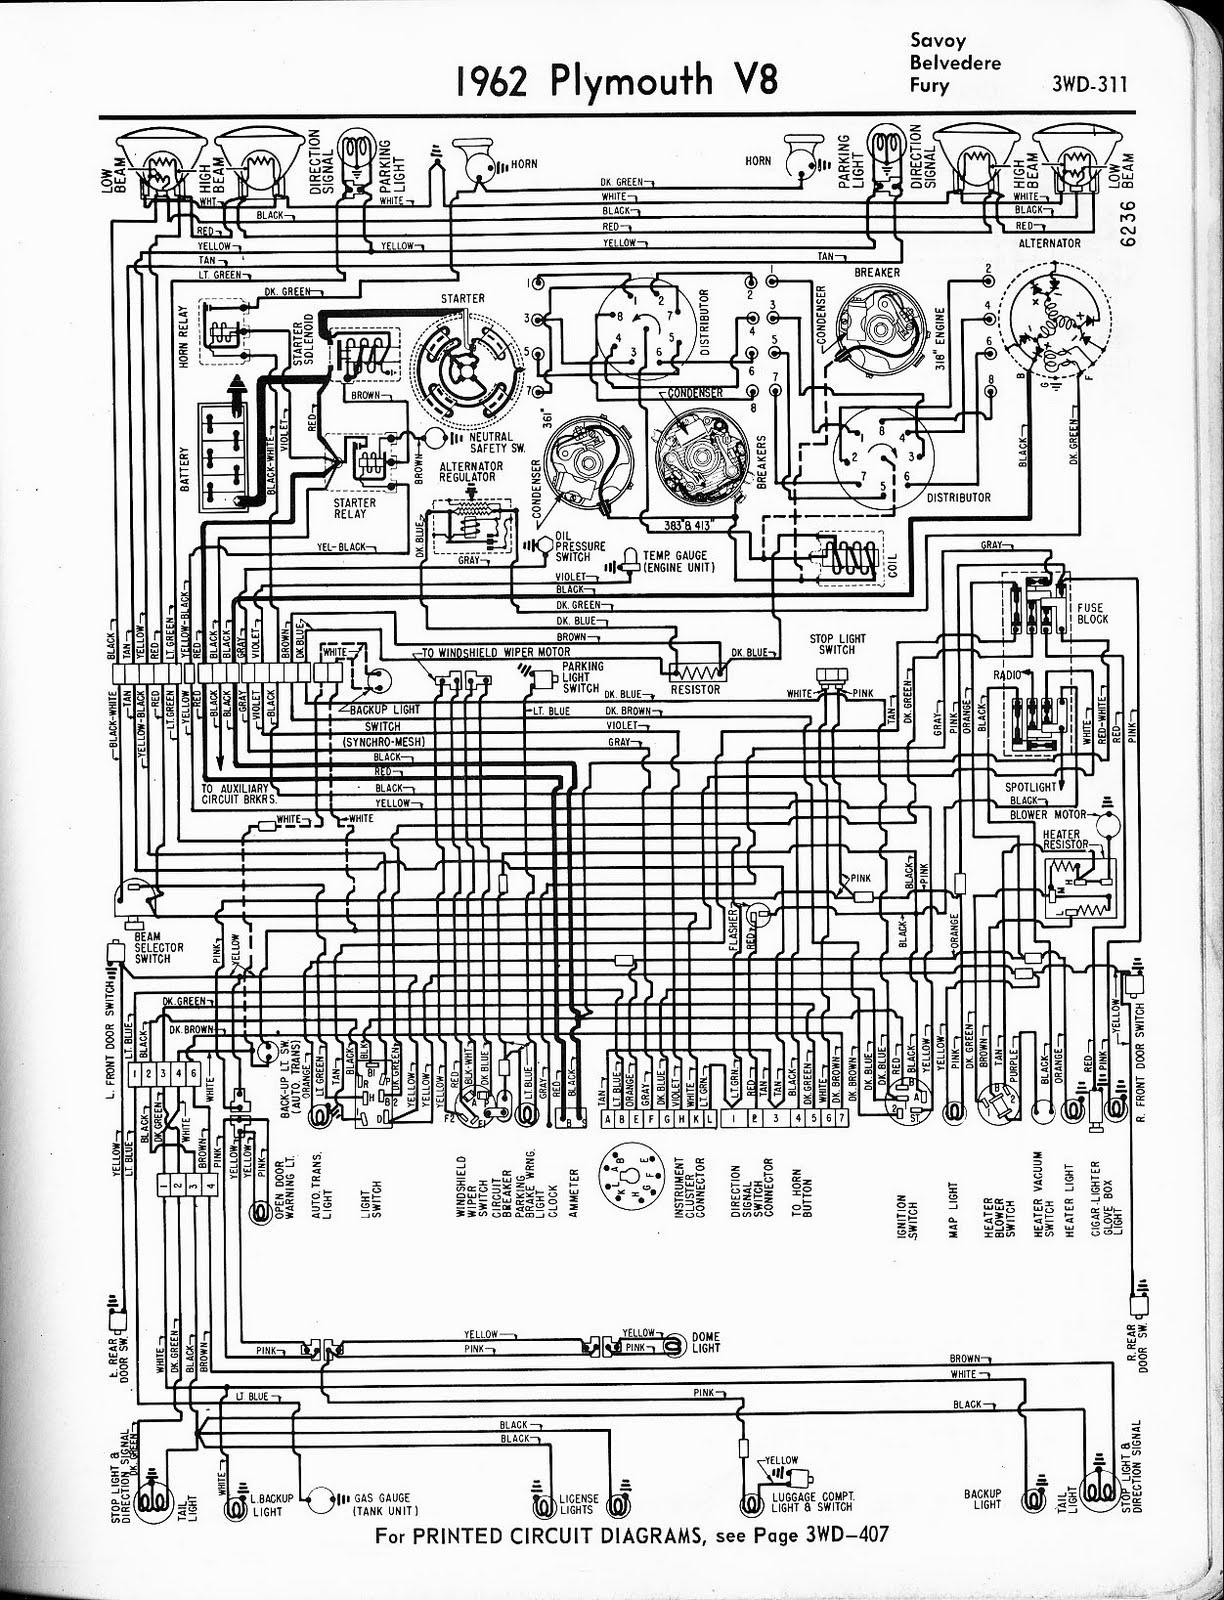 Free Auto Wiring Diagram  1962 Plymouth V8 Savoy